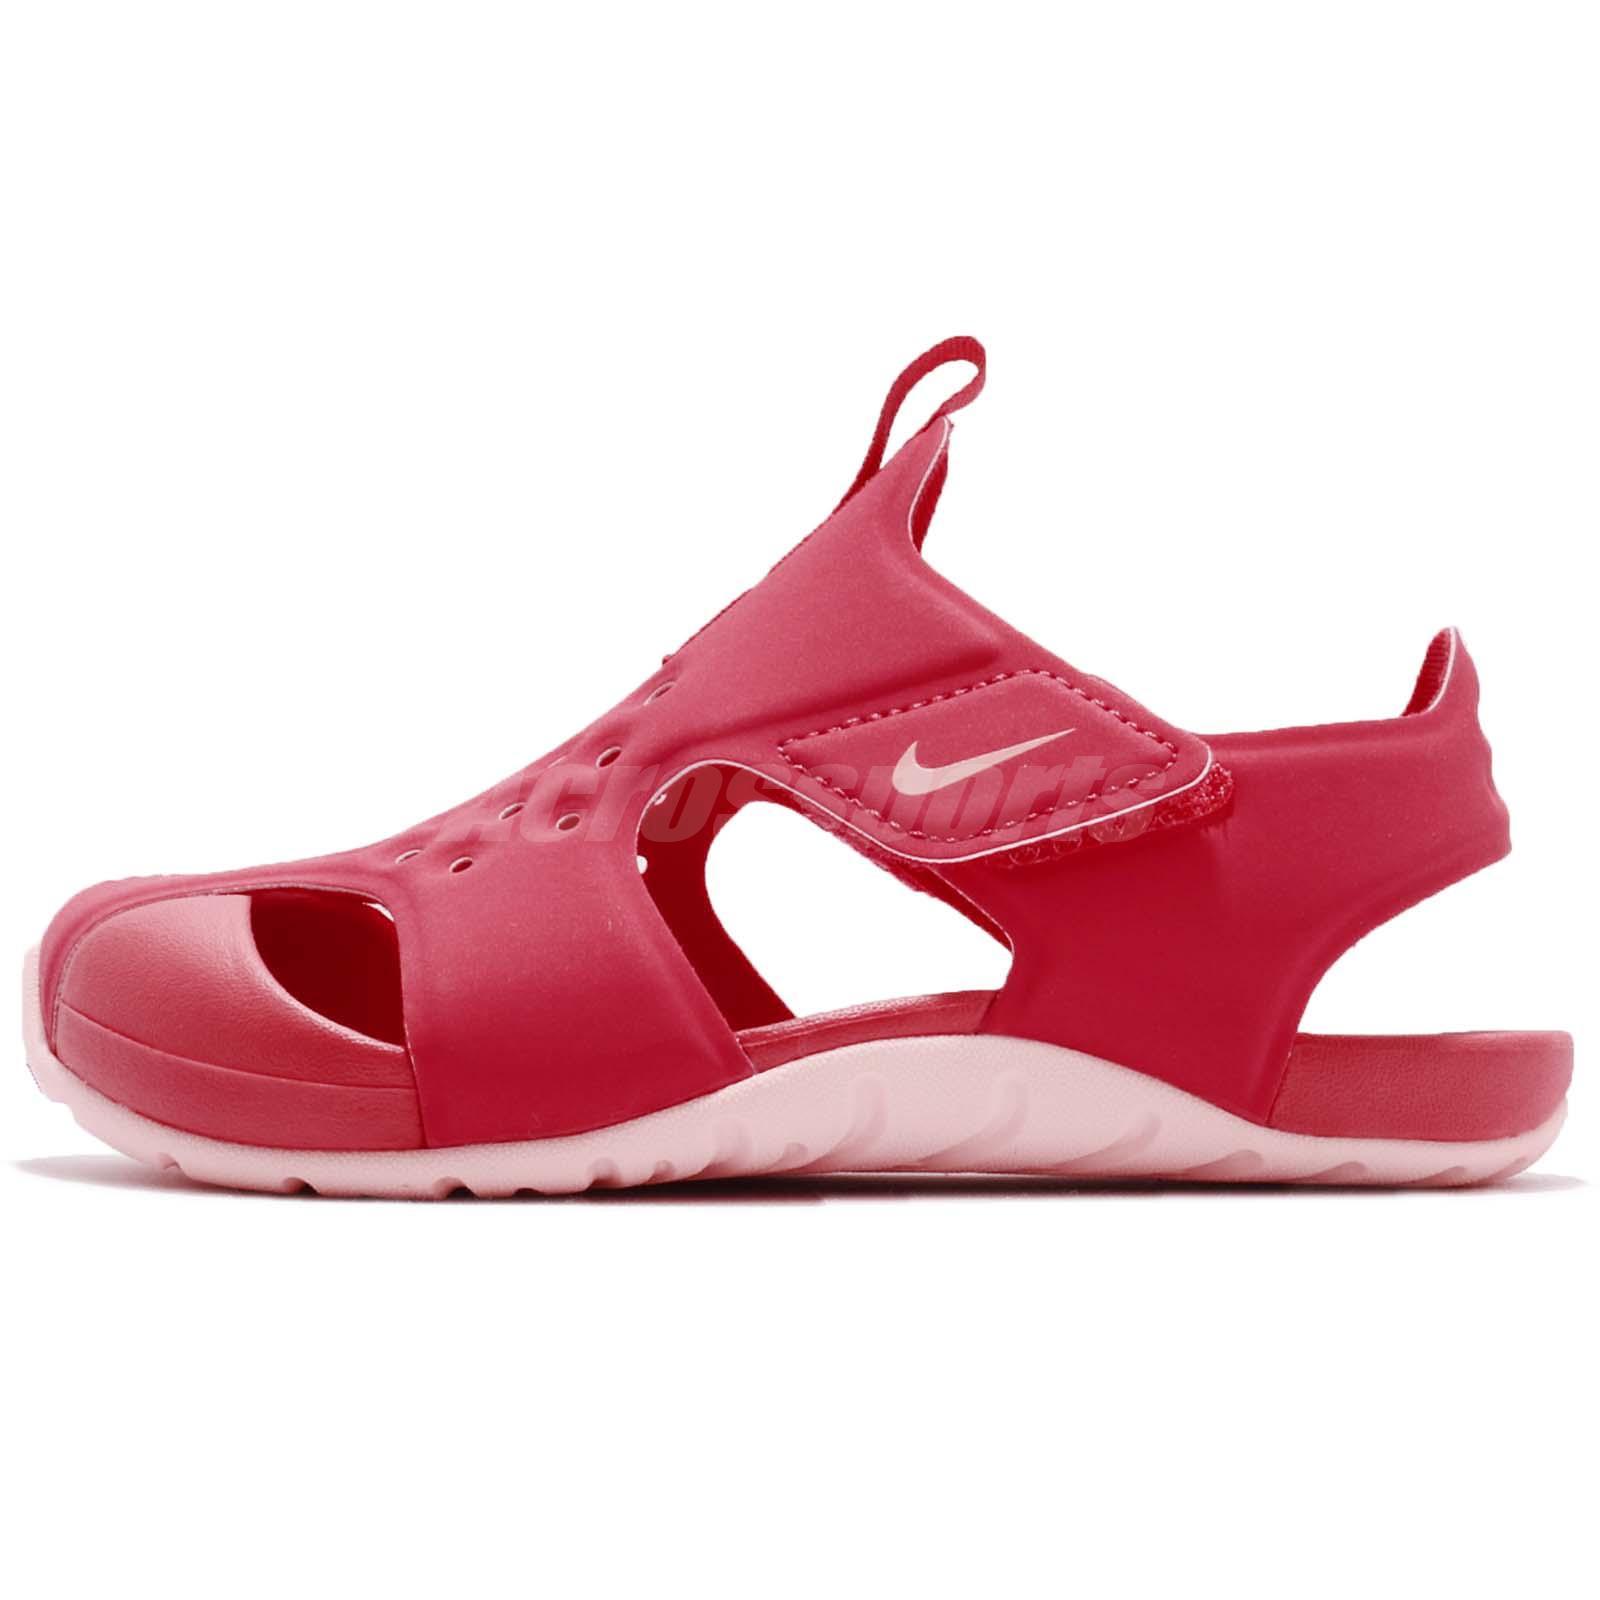 a2573635b227 Nike Sunray Protect 2 PS Tropical Pink Preschool Girl Sandal Shoes  943828-600